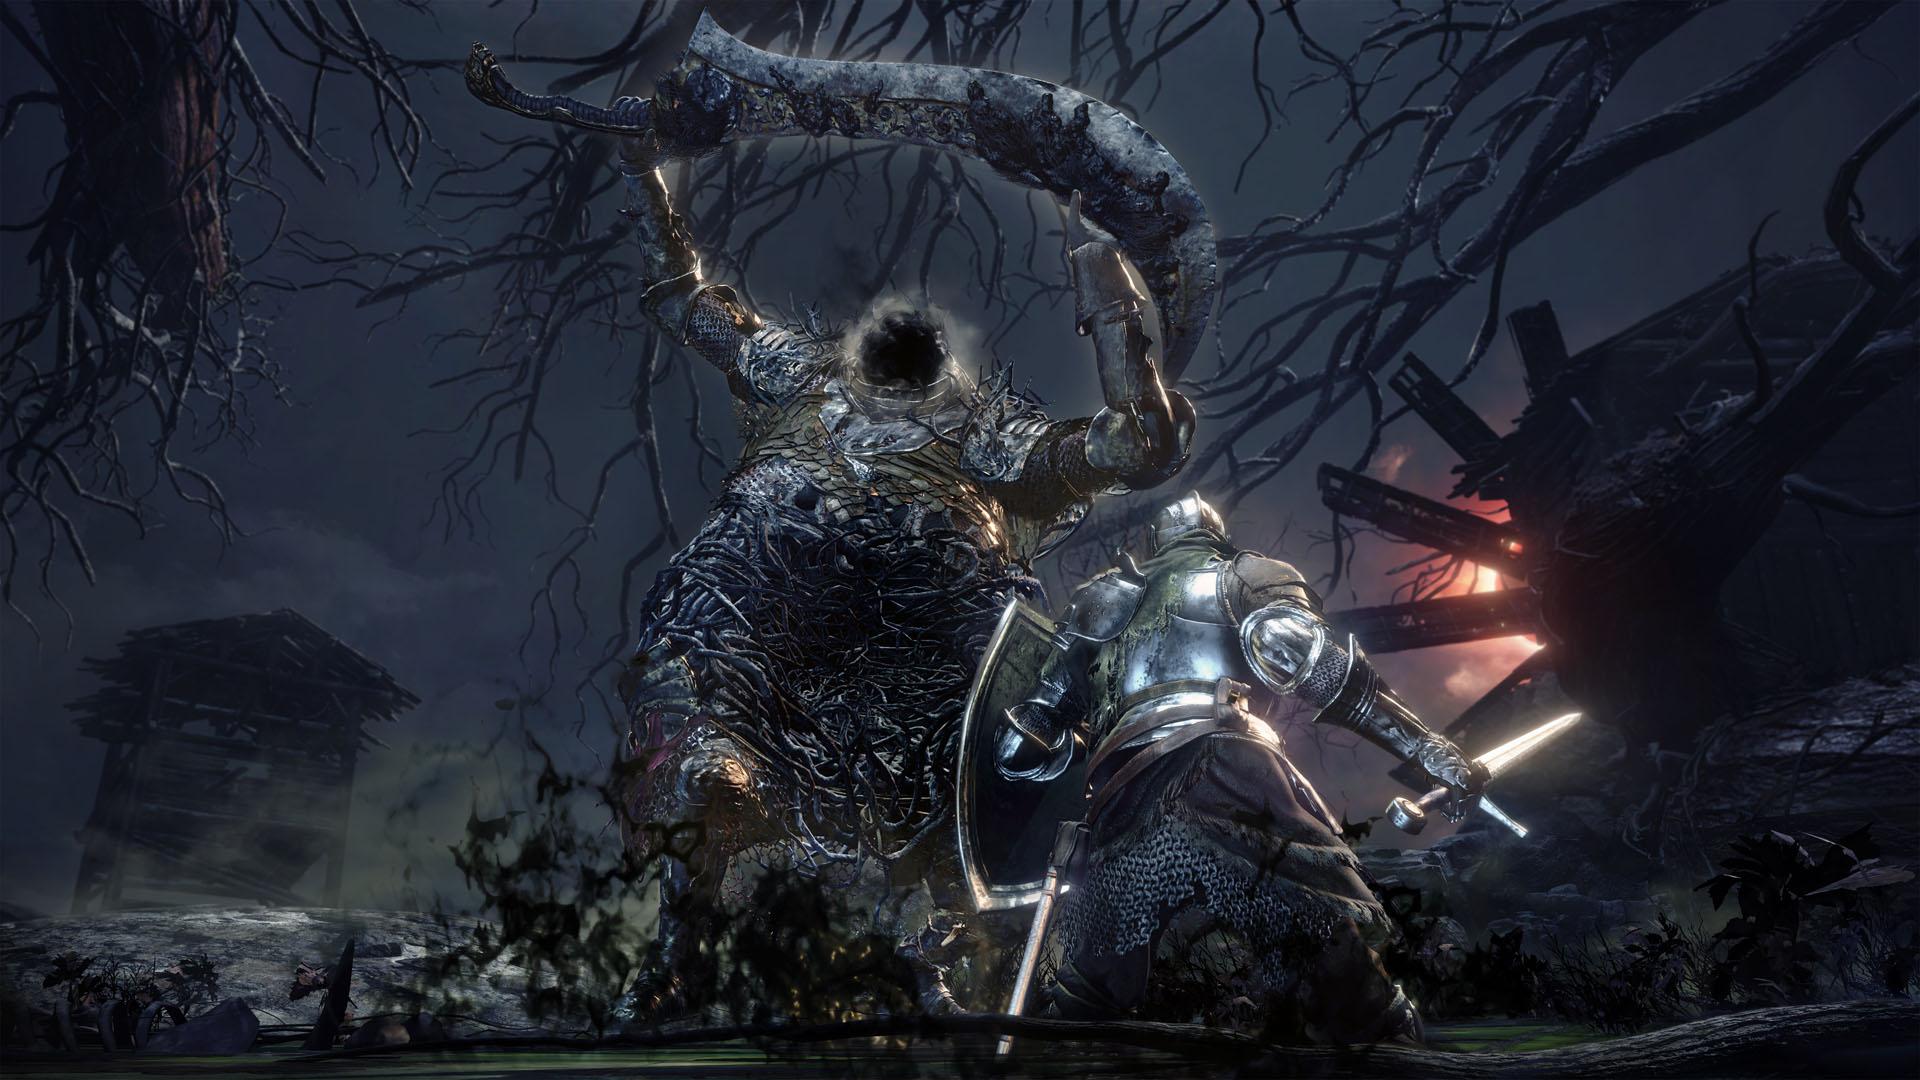 Dark Souls III: The Ringed City image 3